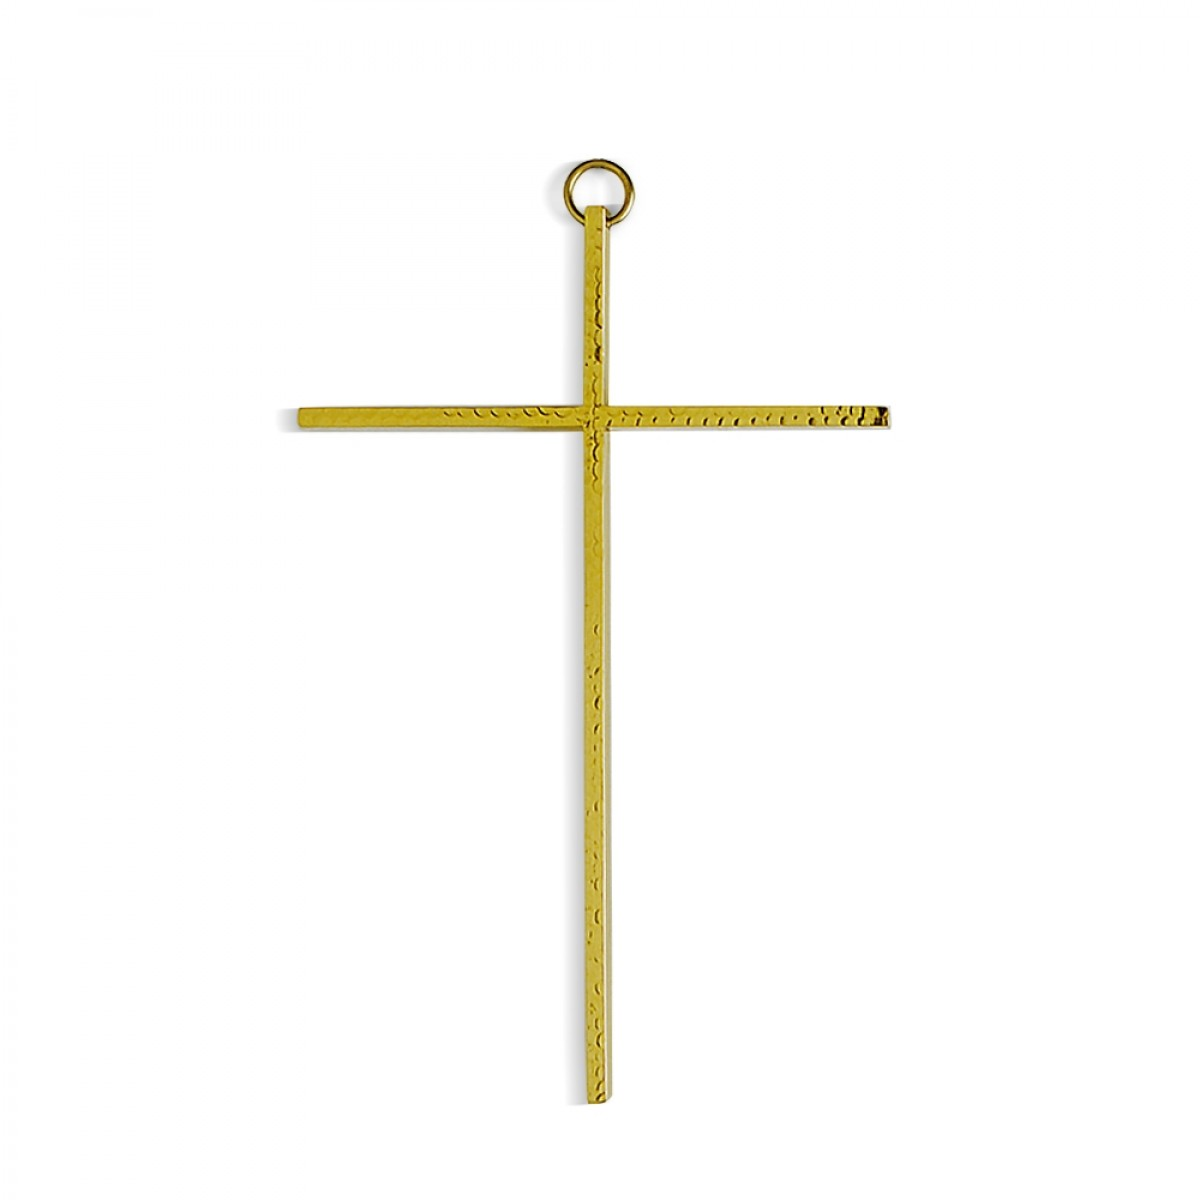 Croce da appendere martellata - art. C. N 8 M - finitura dorata